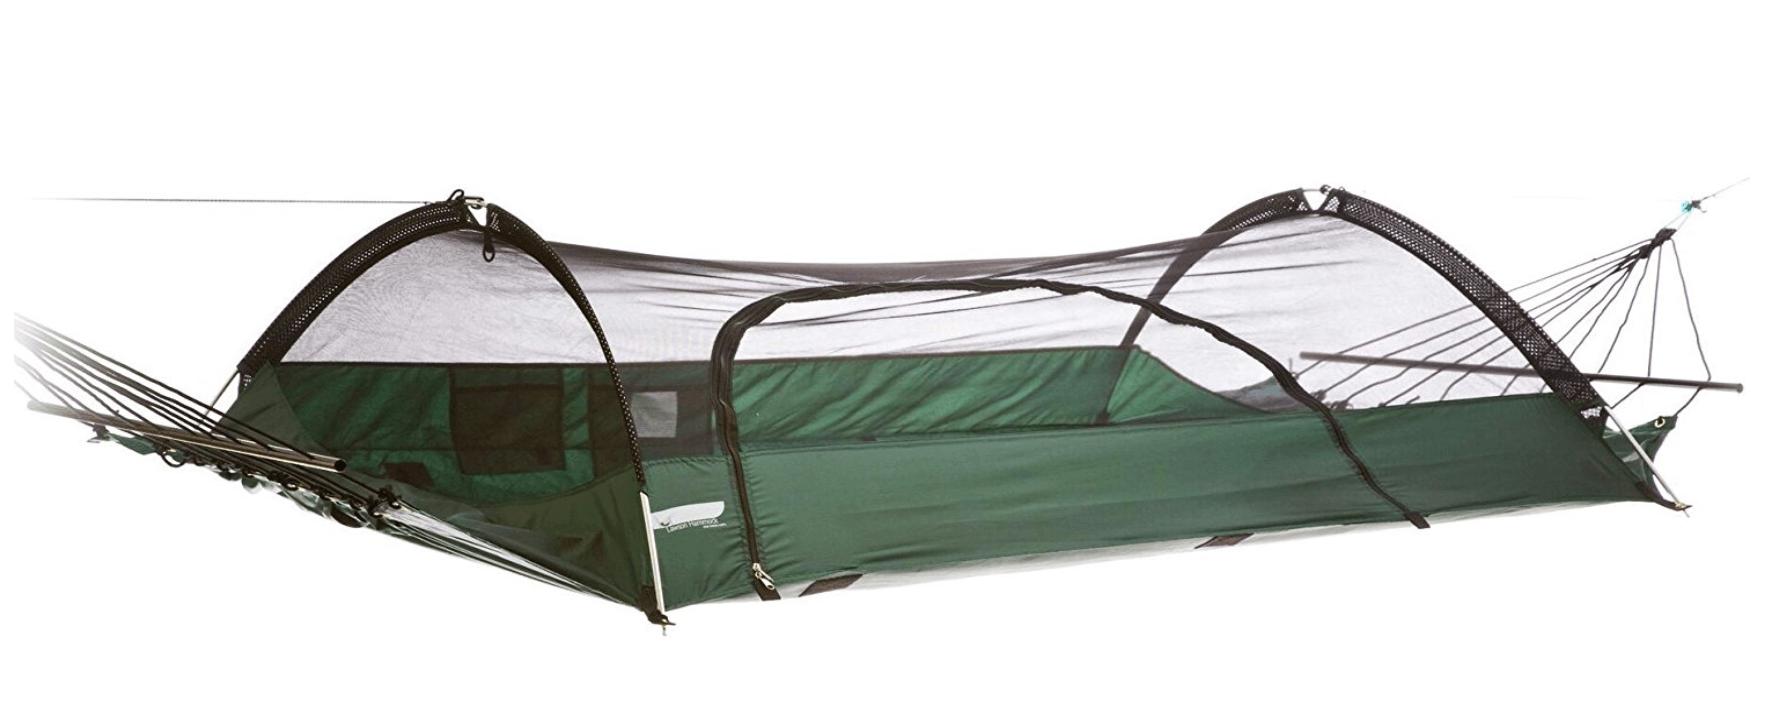 lawson tent/hammock